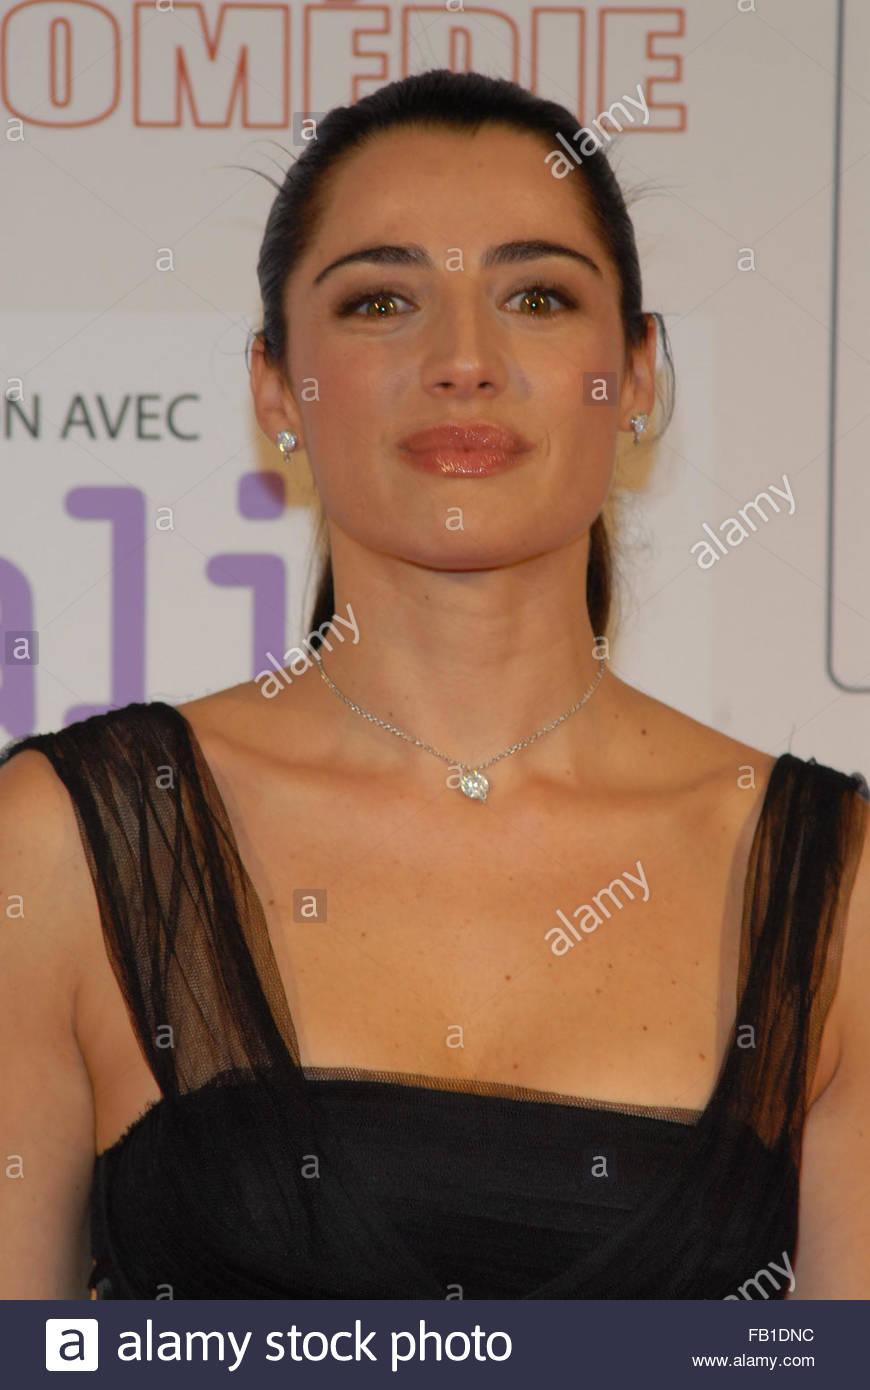 Luisa ranieri Banque D'Images